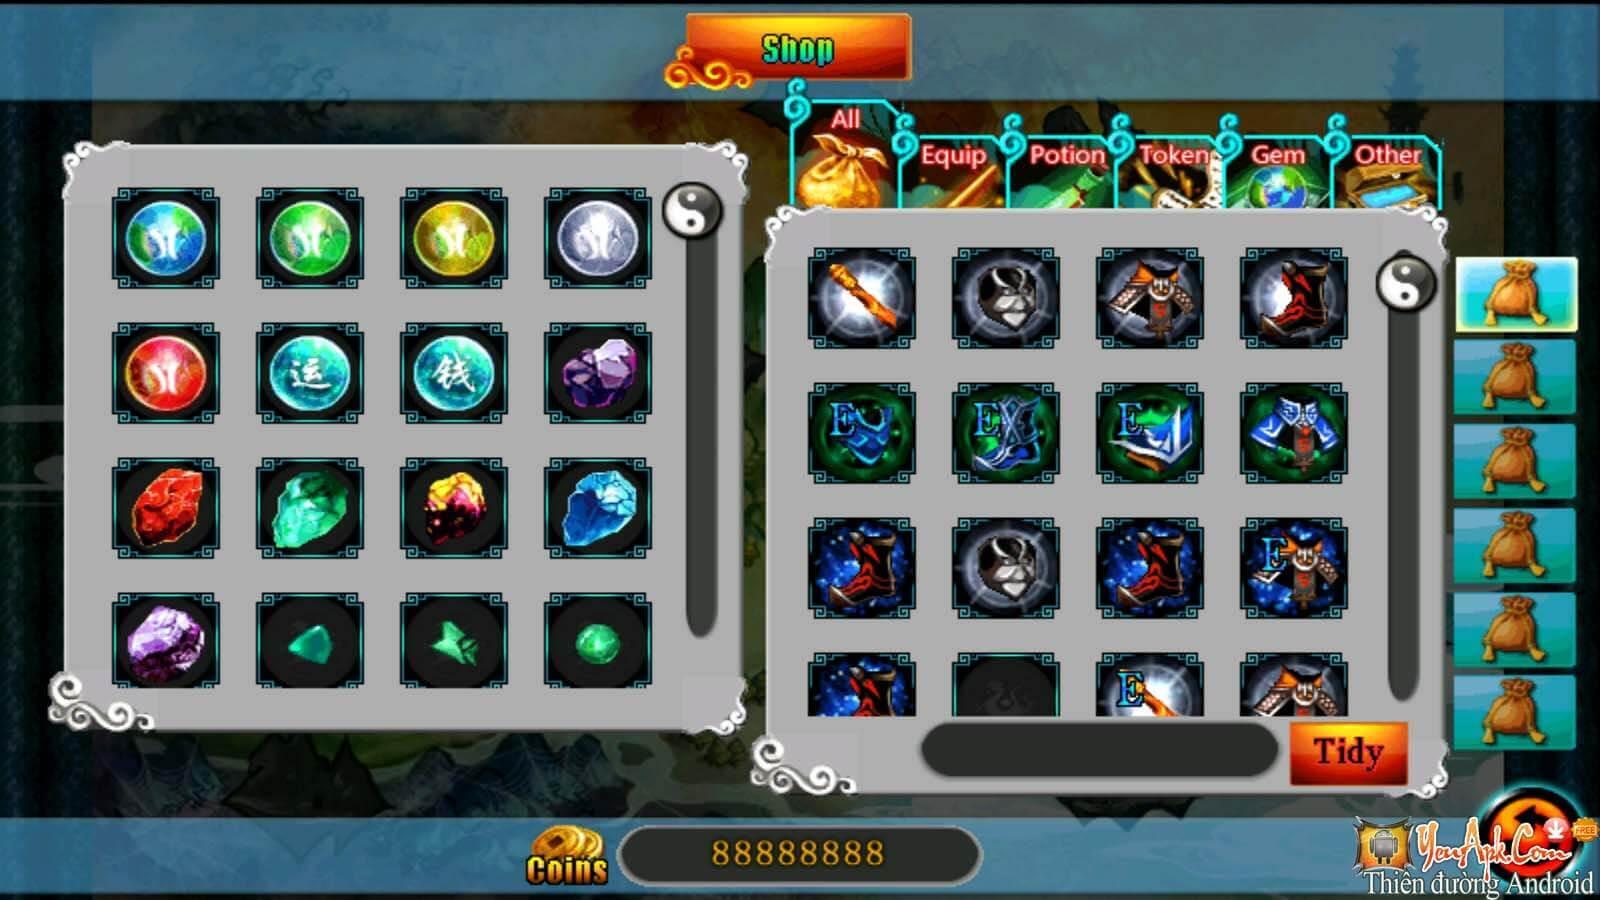 windroye-screenshot-1453388678 copy